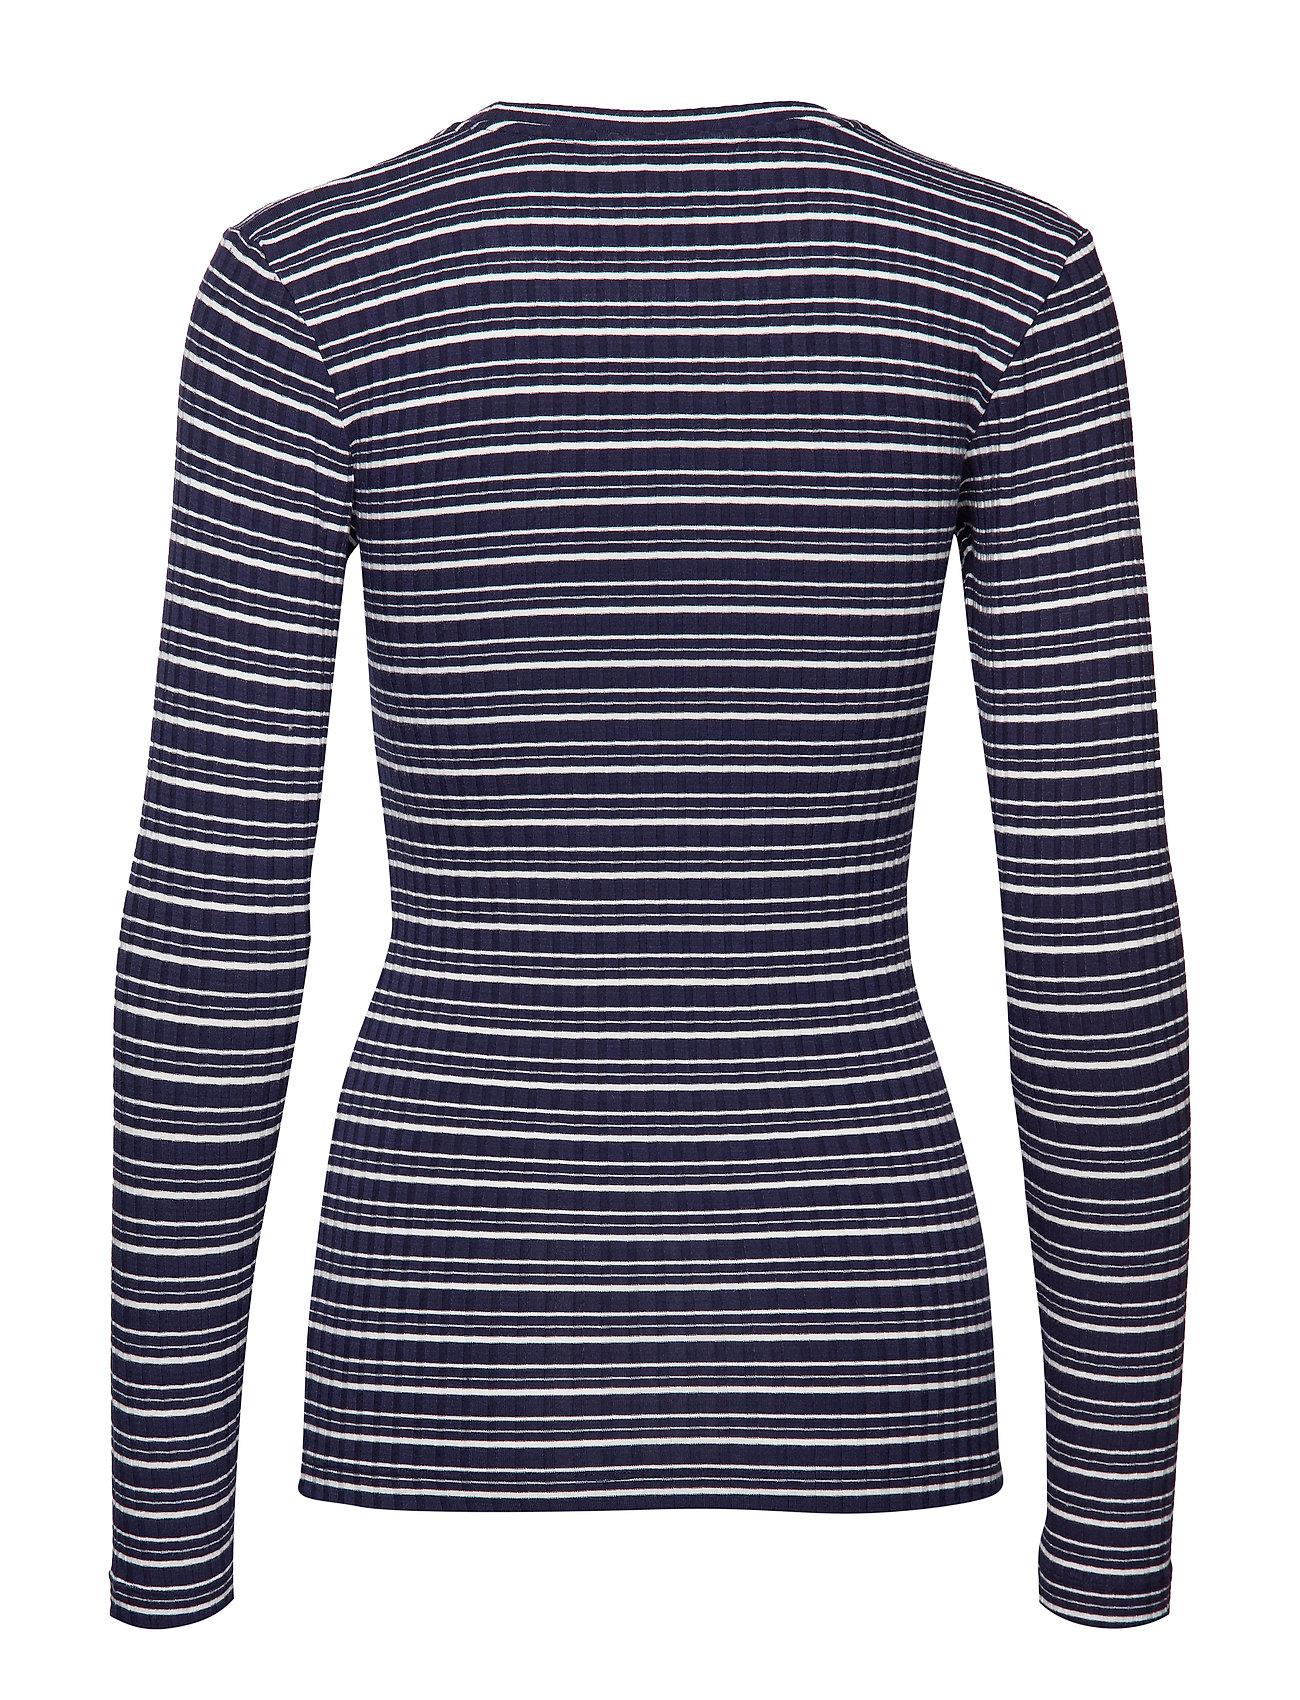 5x5 Cool Stripe Tuba S Langærmet T shirt Blå Mads Nørgaard